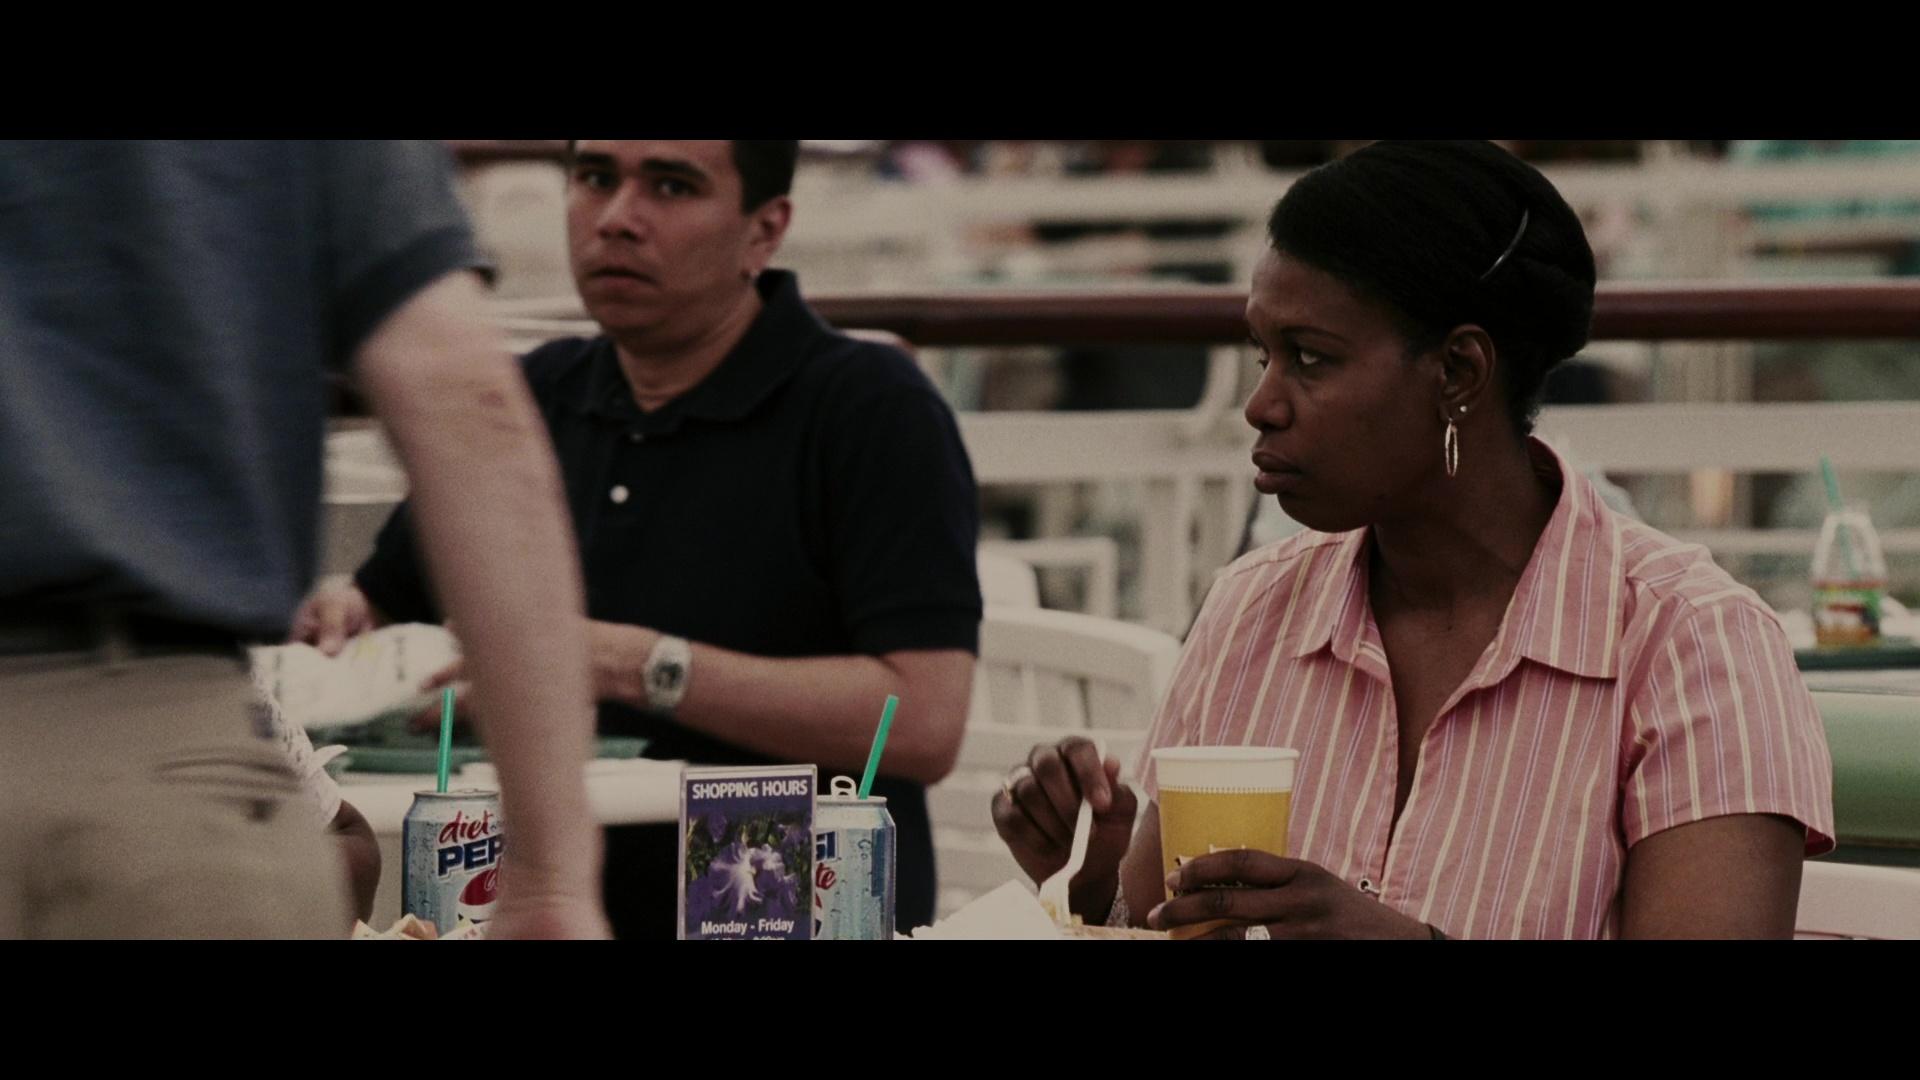 diet pepsi in the sentinel 2006 movie